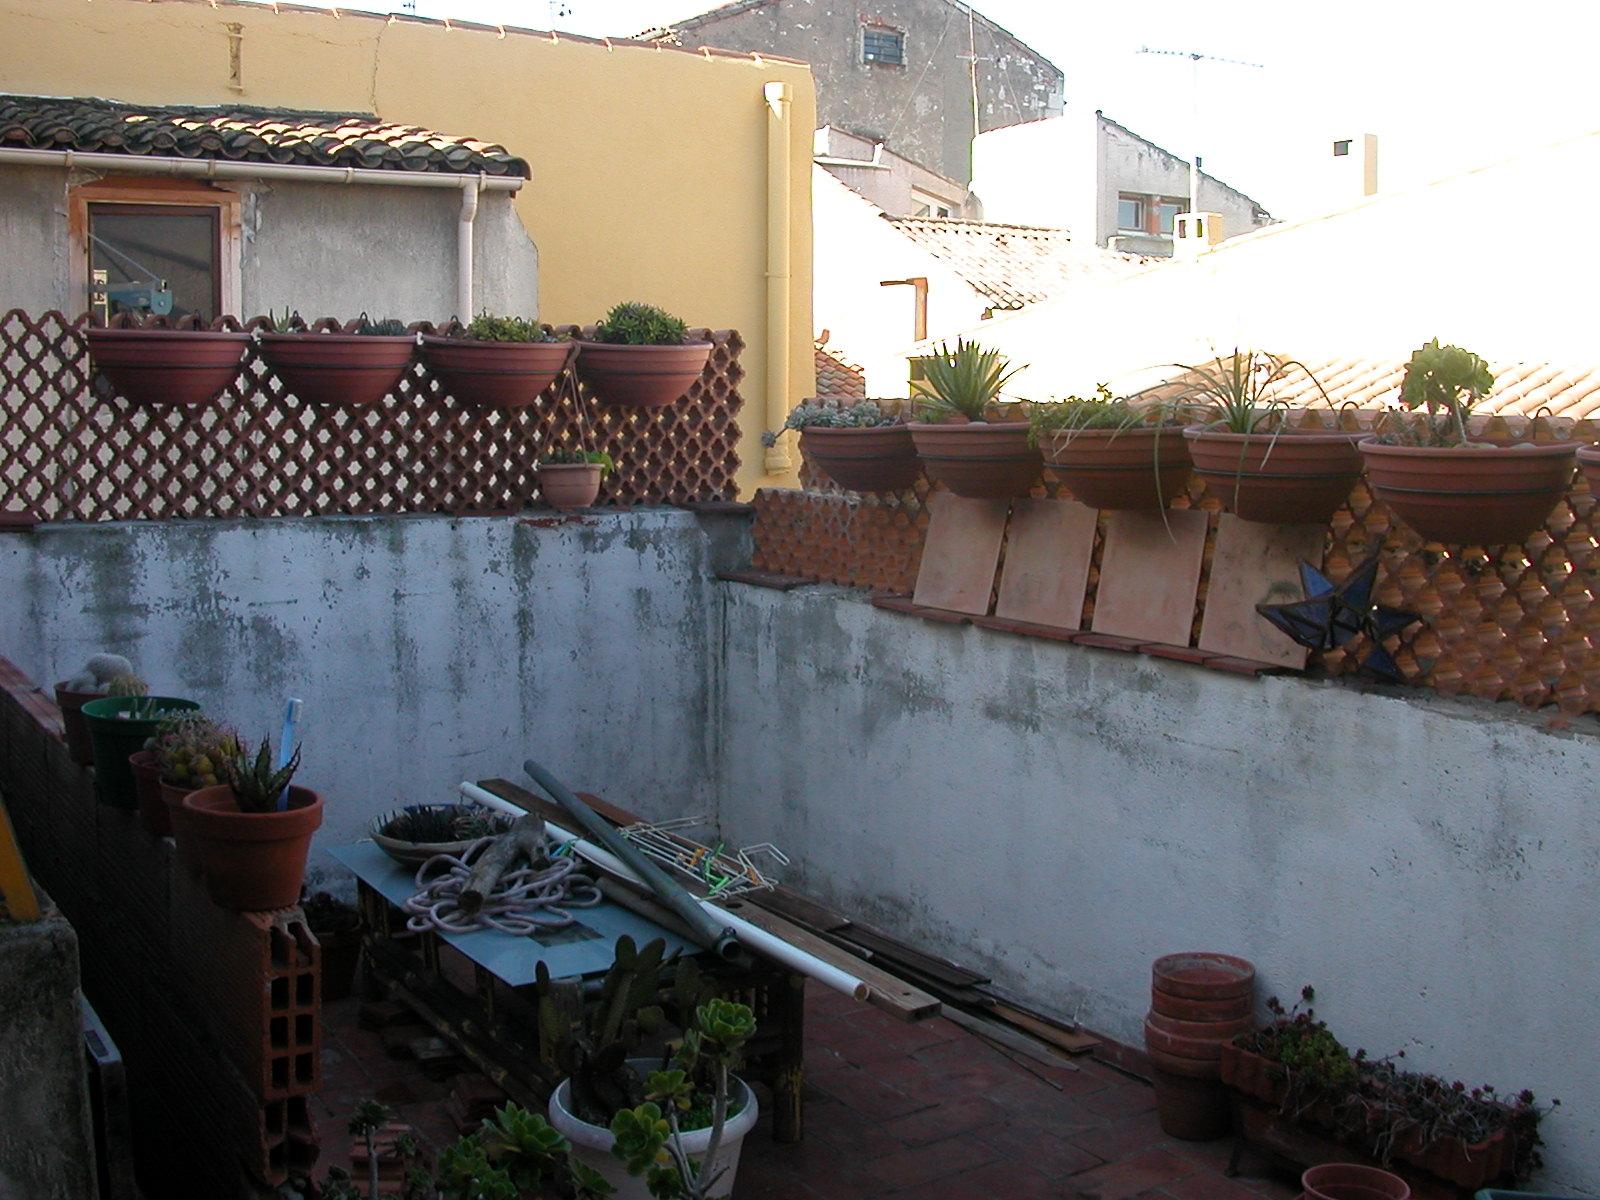 La draperie terrasse - Banquette beton cellulaire ...